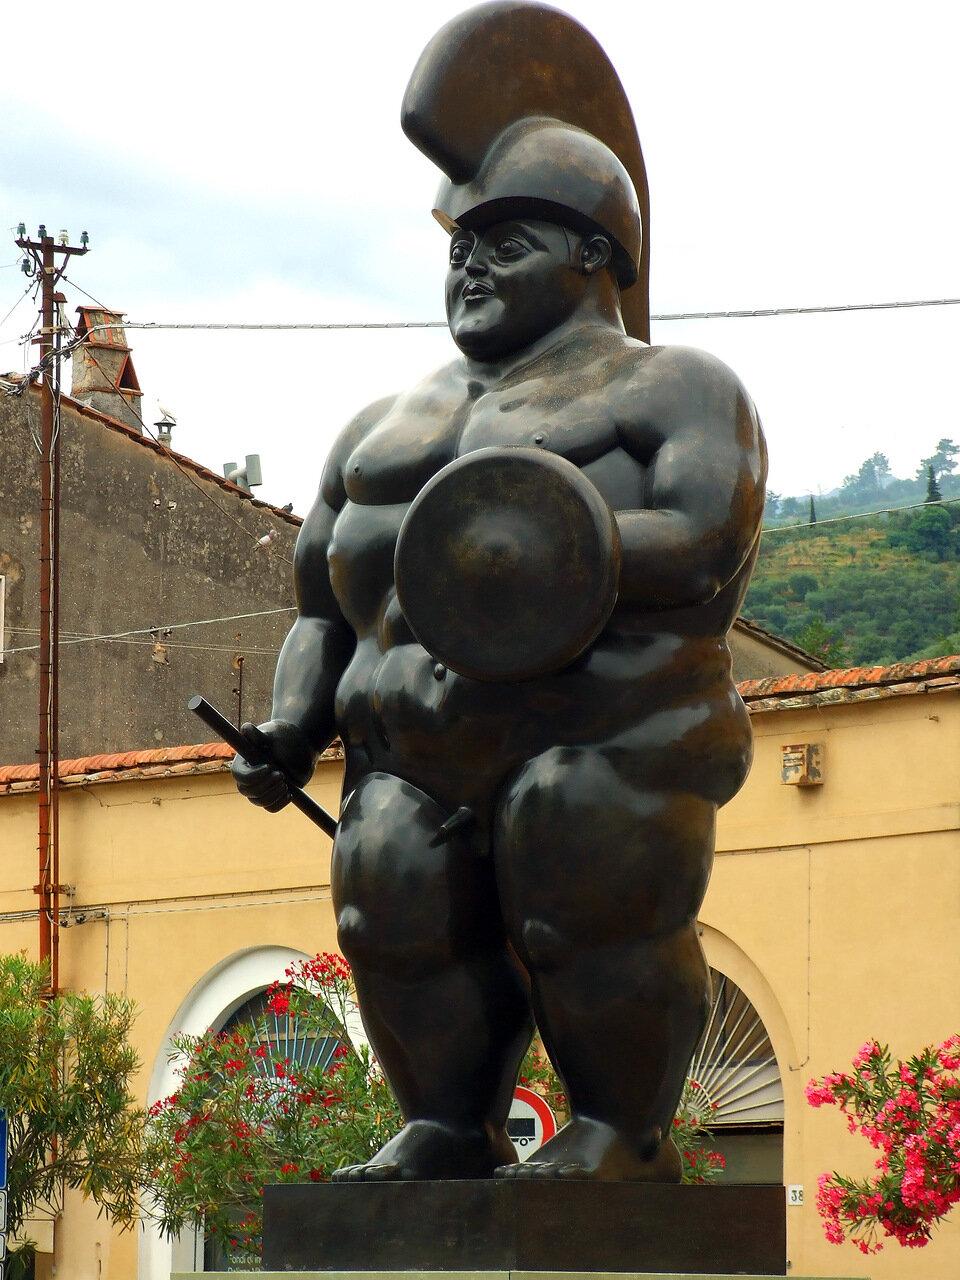 Центурион (Centurion) скульптора Фернандо Ботеро (Fernando Botero) в городе Пьетрасанта (Pietrasanta)